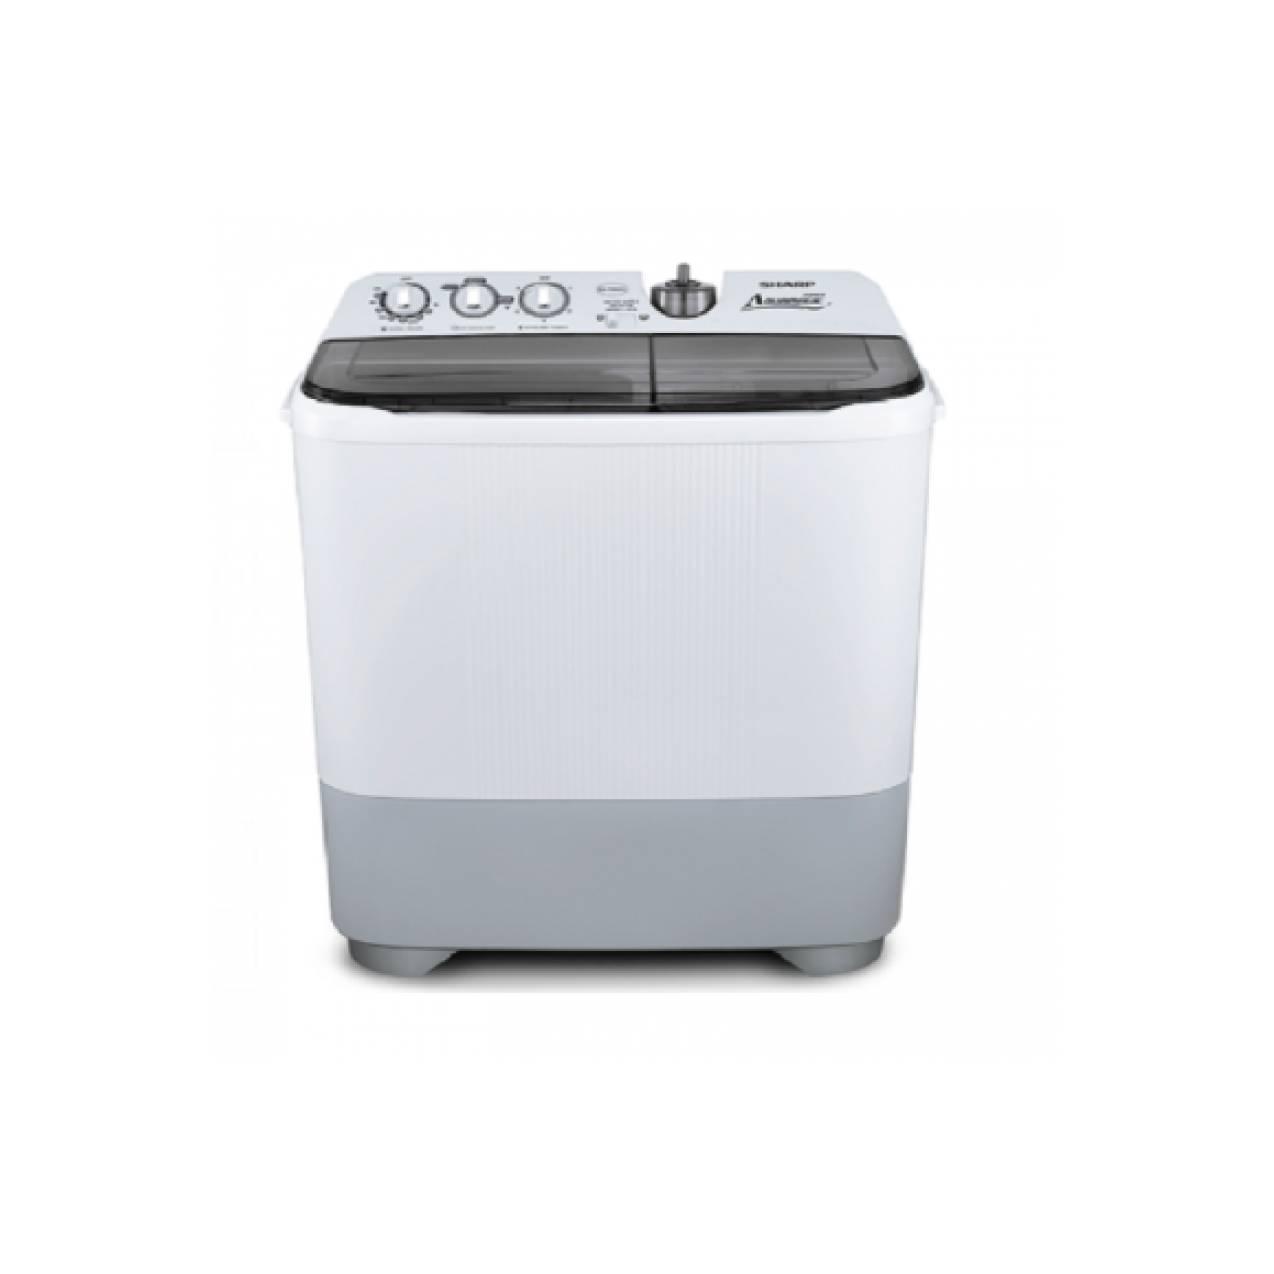 SHARP Mesin Cuci ES-T95CL, low watt, 9kg, murah